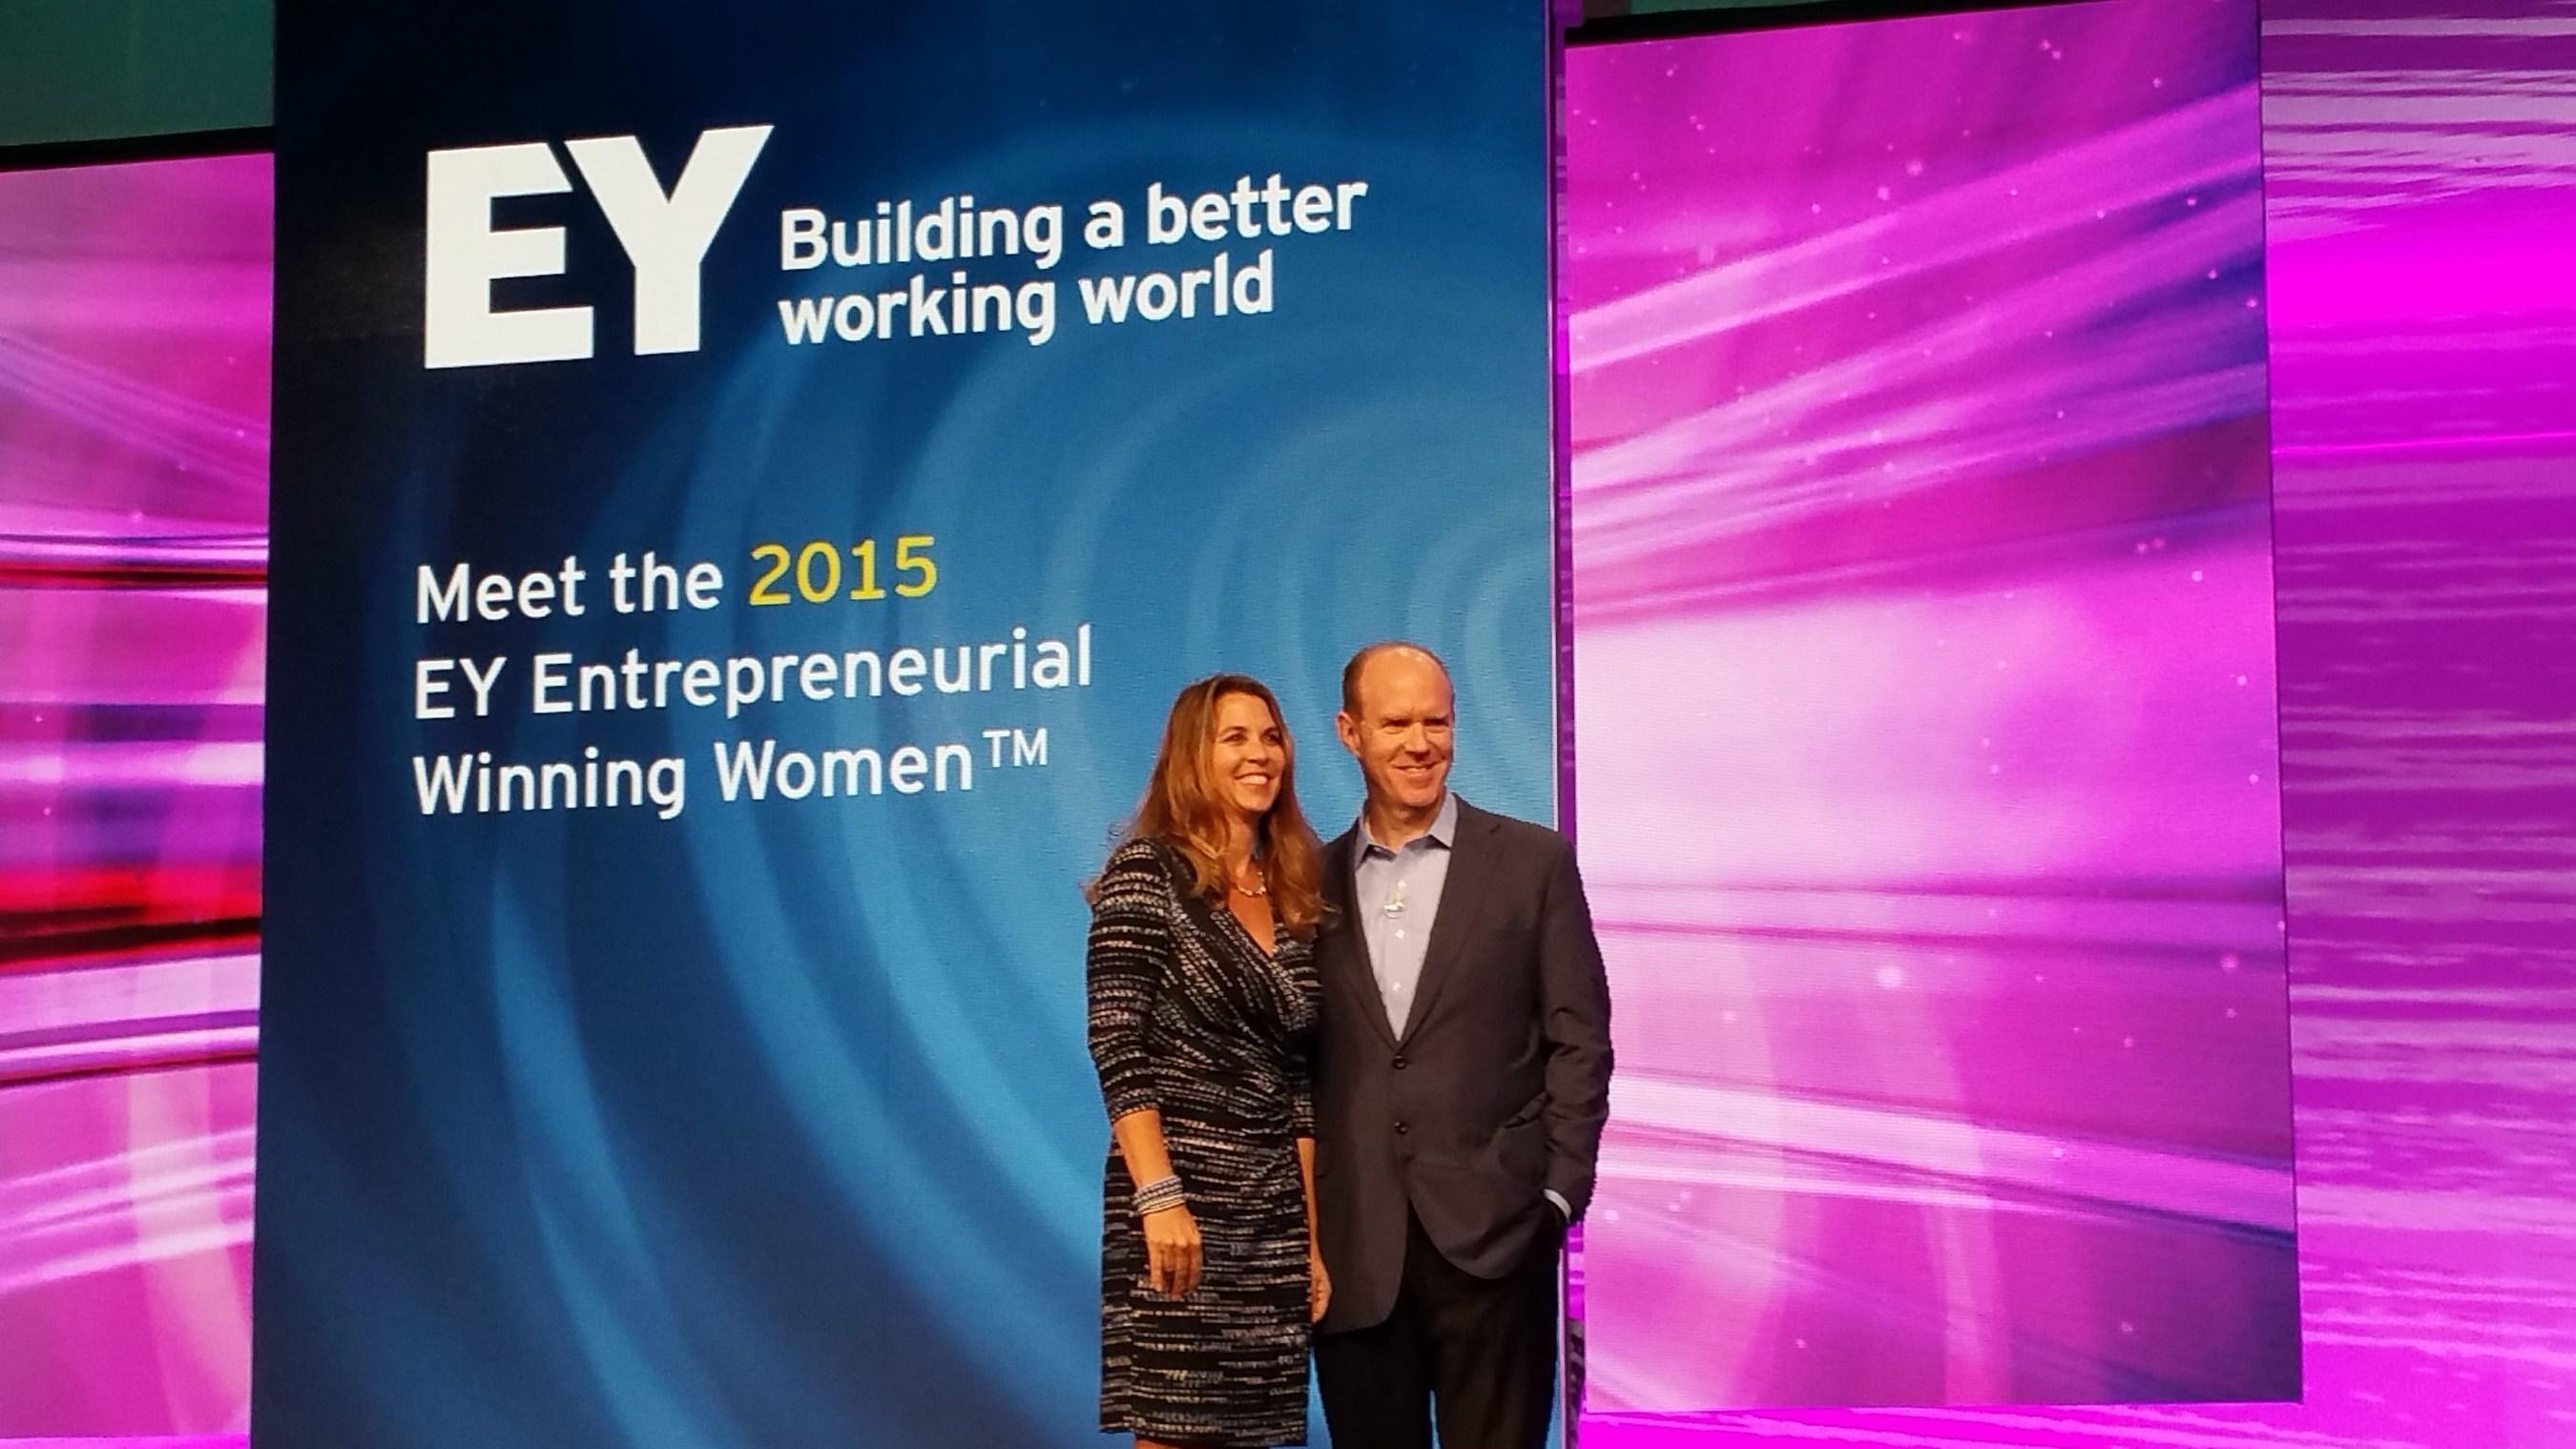 Michelle Vondrasek of Von Technologies, LLC Named One of North America's Top Women Entrepreneurs by EY